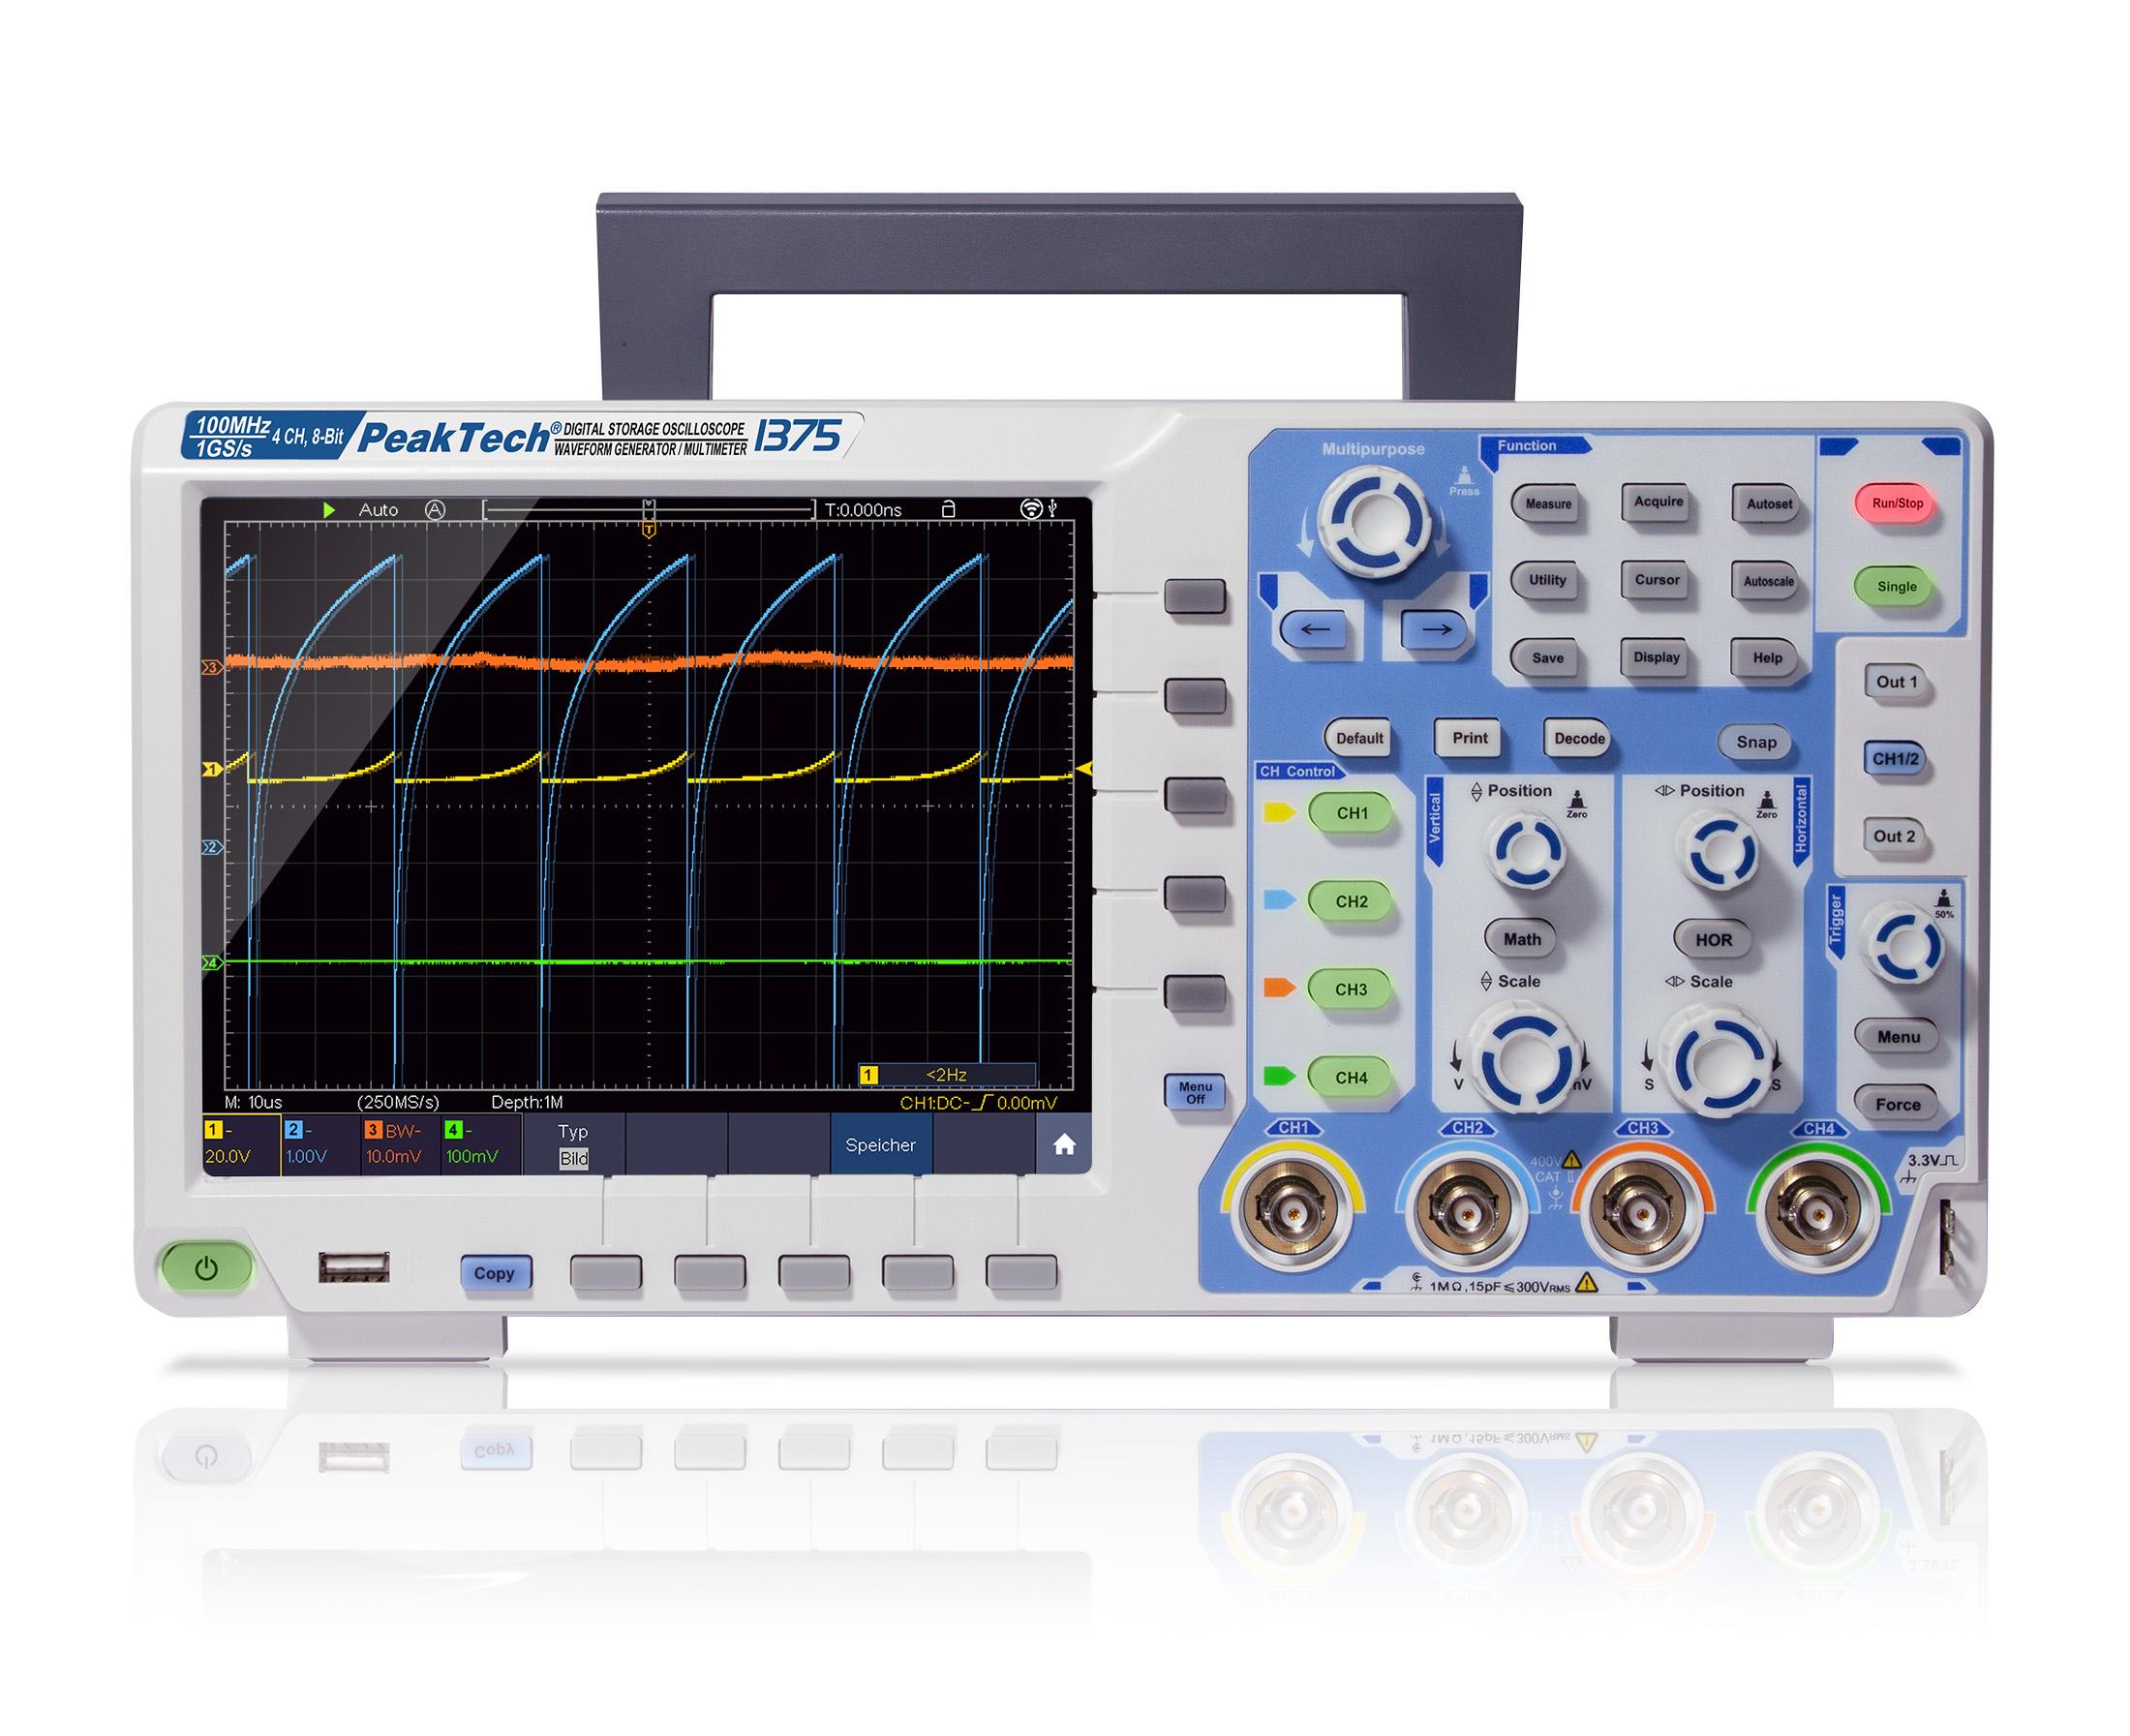 «PeakTech® P 1375» 100 MHz / 4 CH, 1 GS/s touchscreen oscilloscope